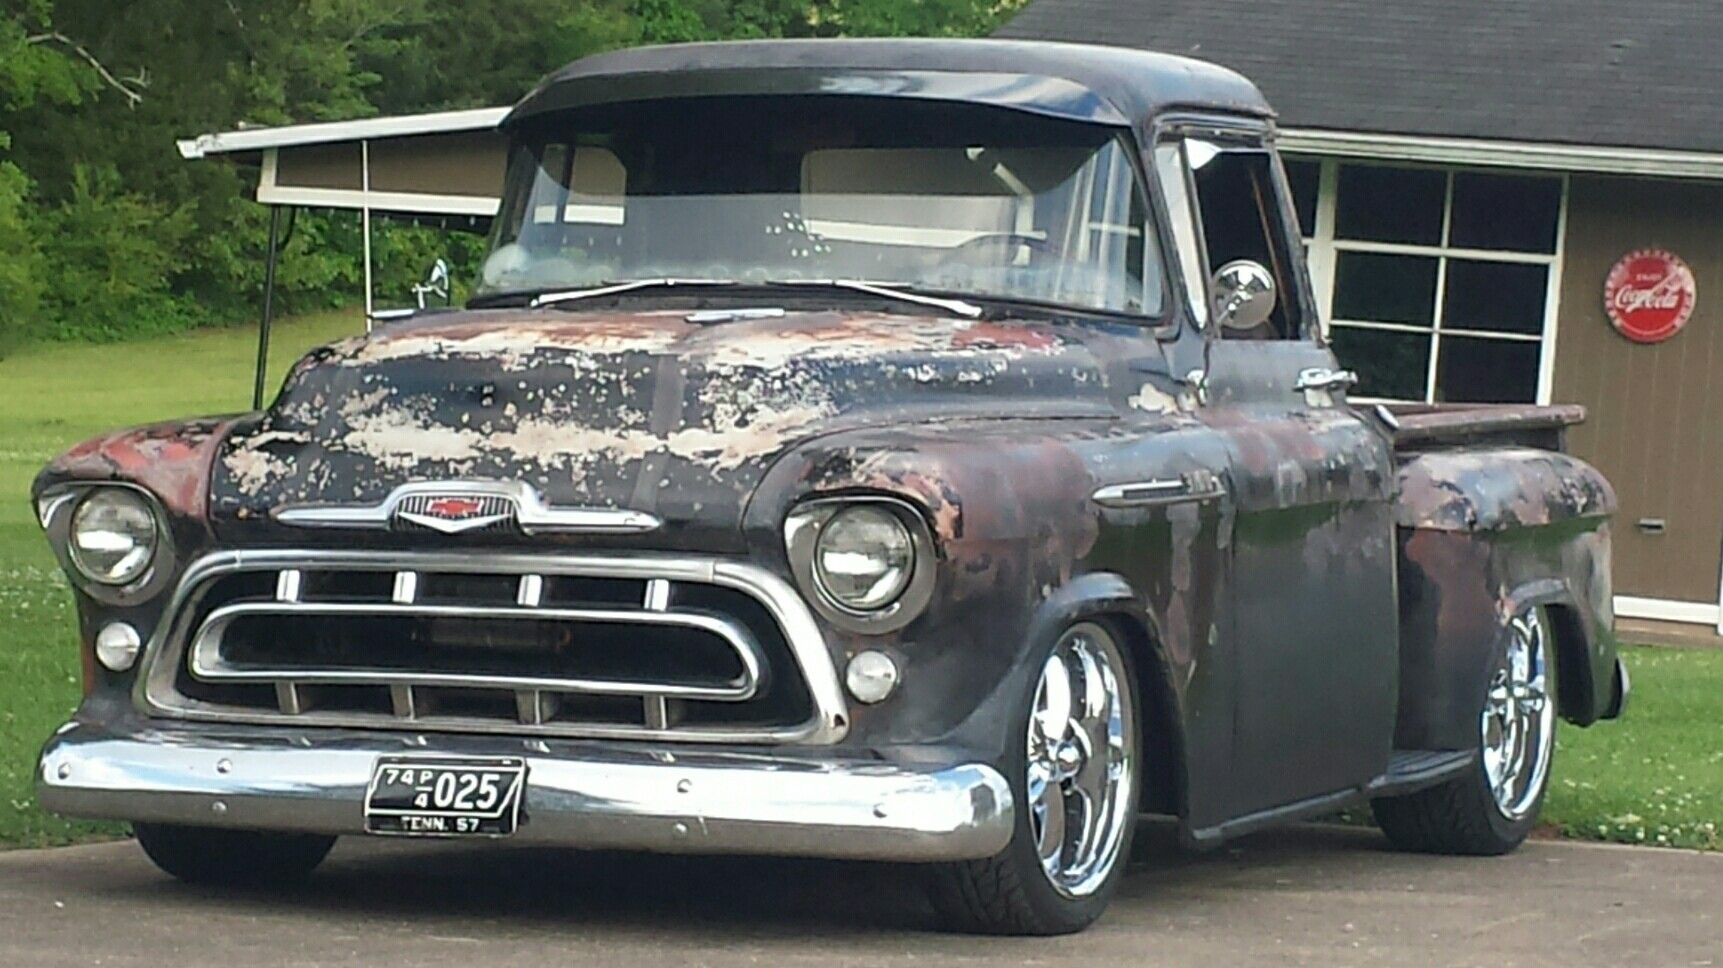 57 chevy truck rat rod garage low rider weathered 3100 series hot rod street rod classic custom  [ 1723 x 968 Pixel ]